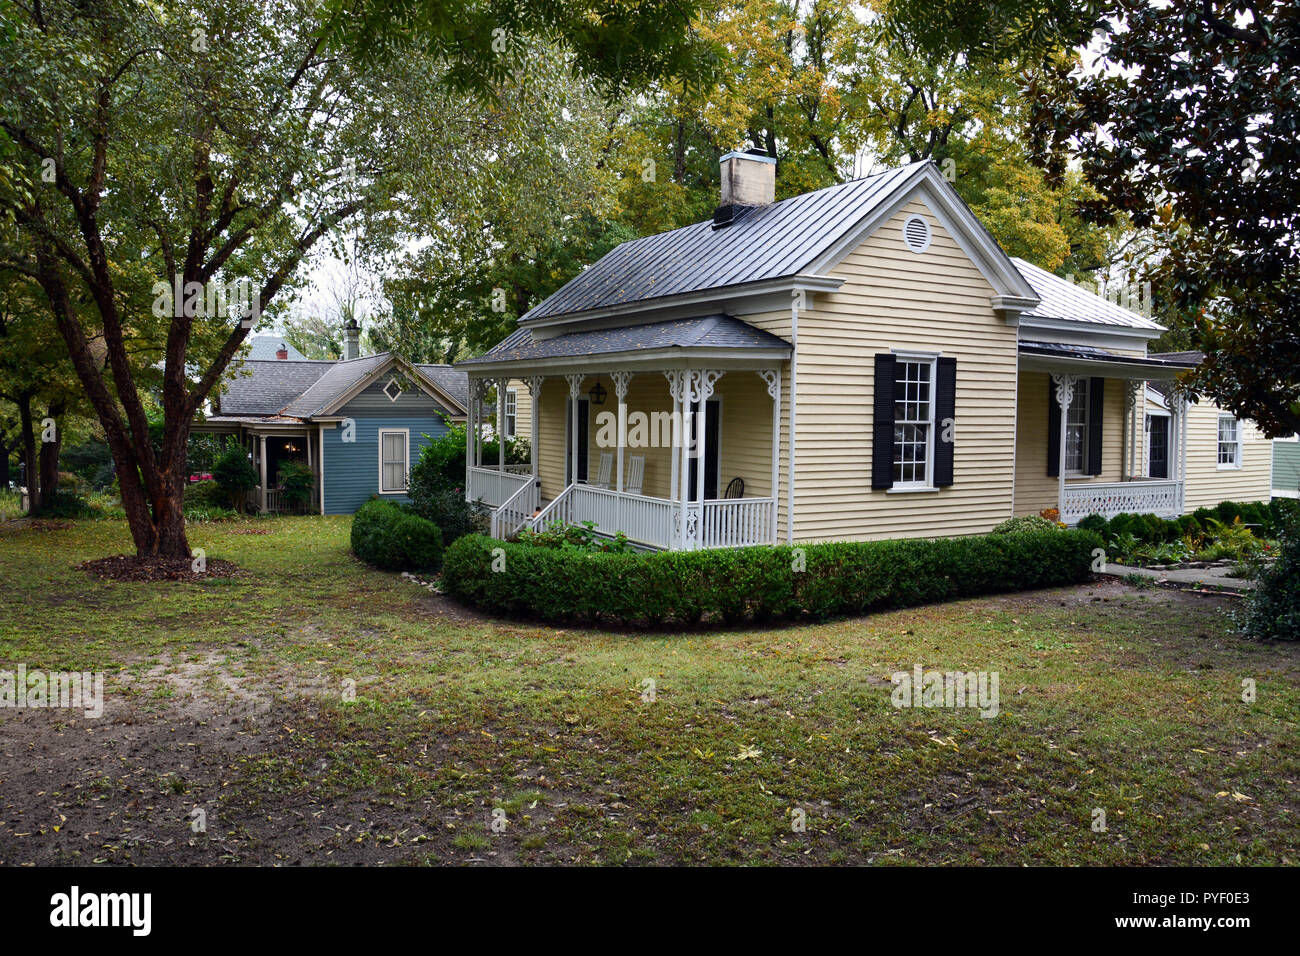 Historic homes in Raleigh North Carolina's Oakwood neighborhood. Stock Photo